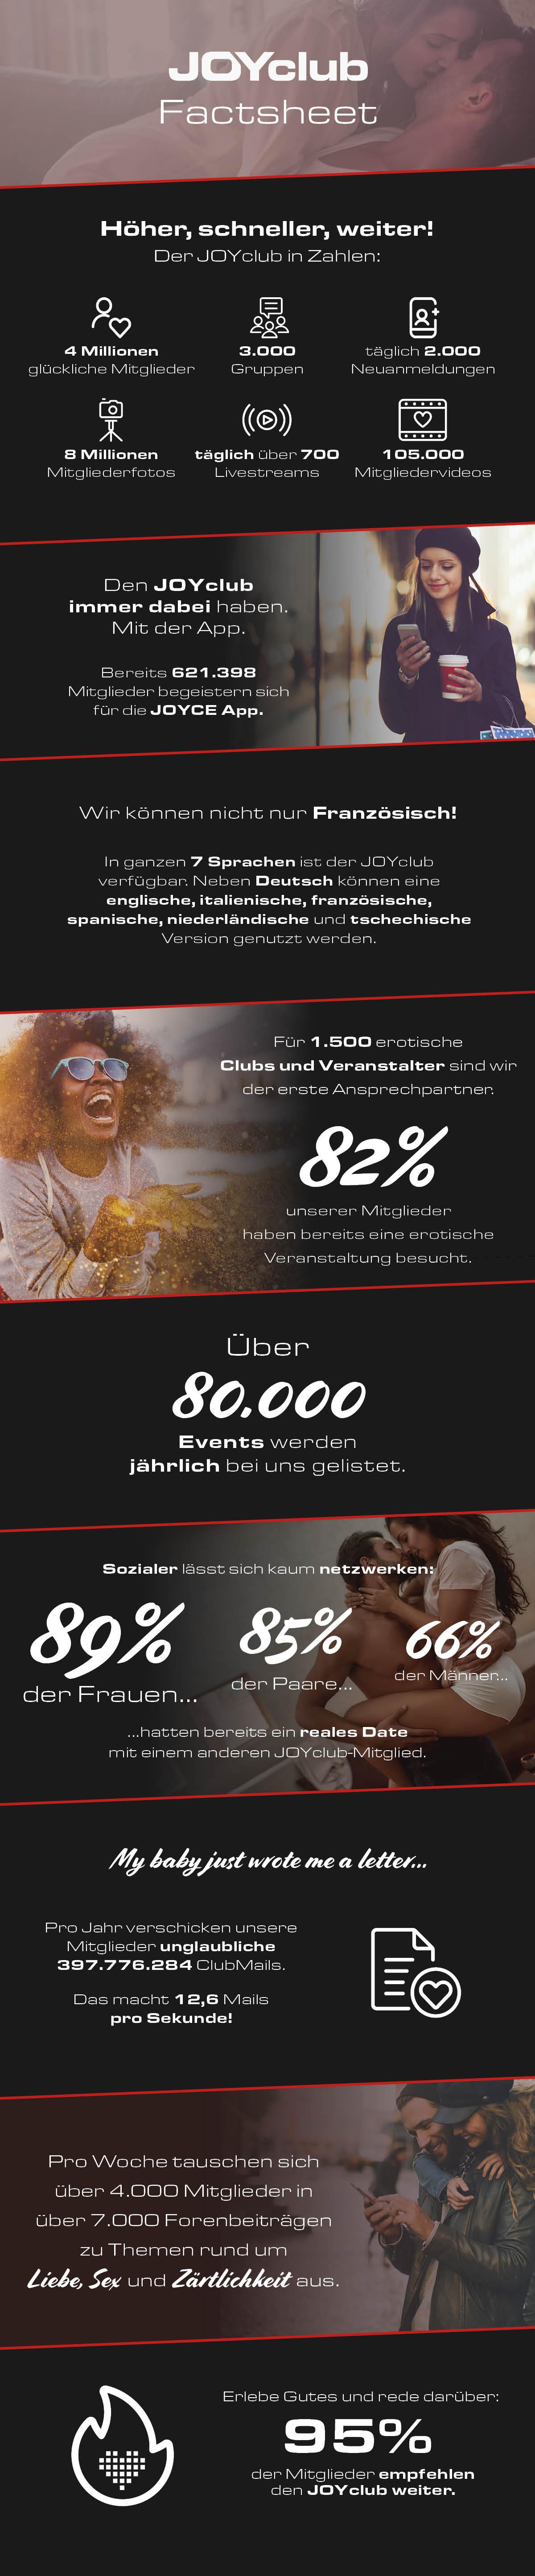 JOYCLUB Factsheet